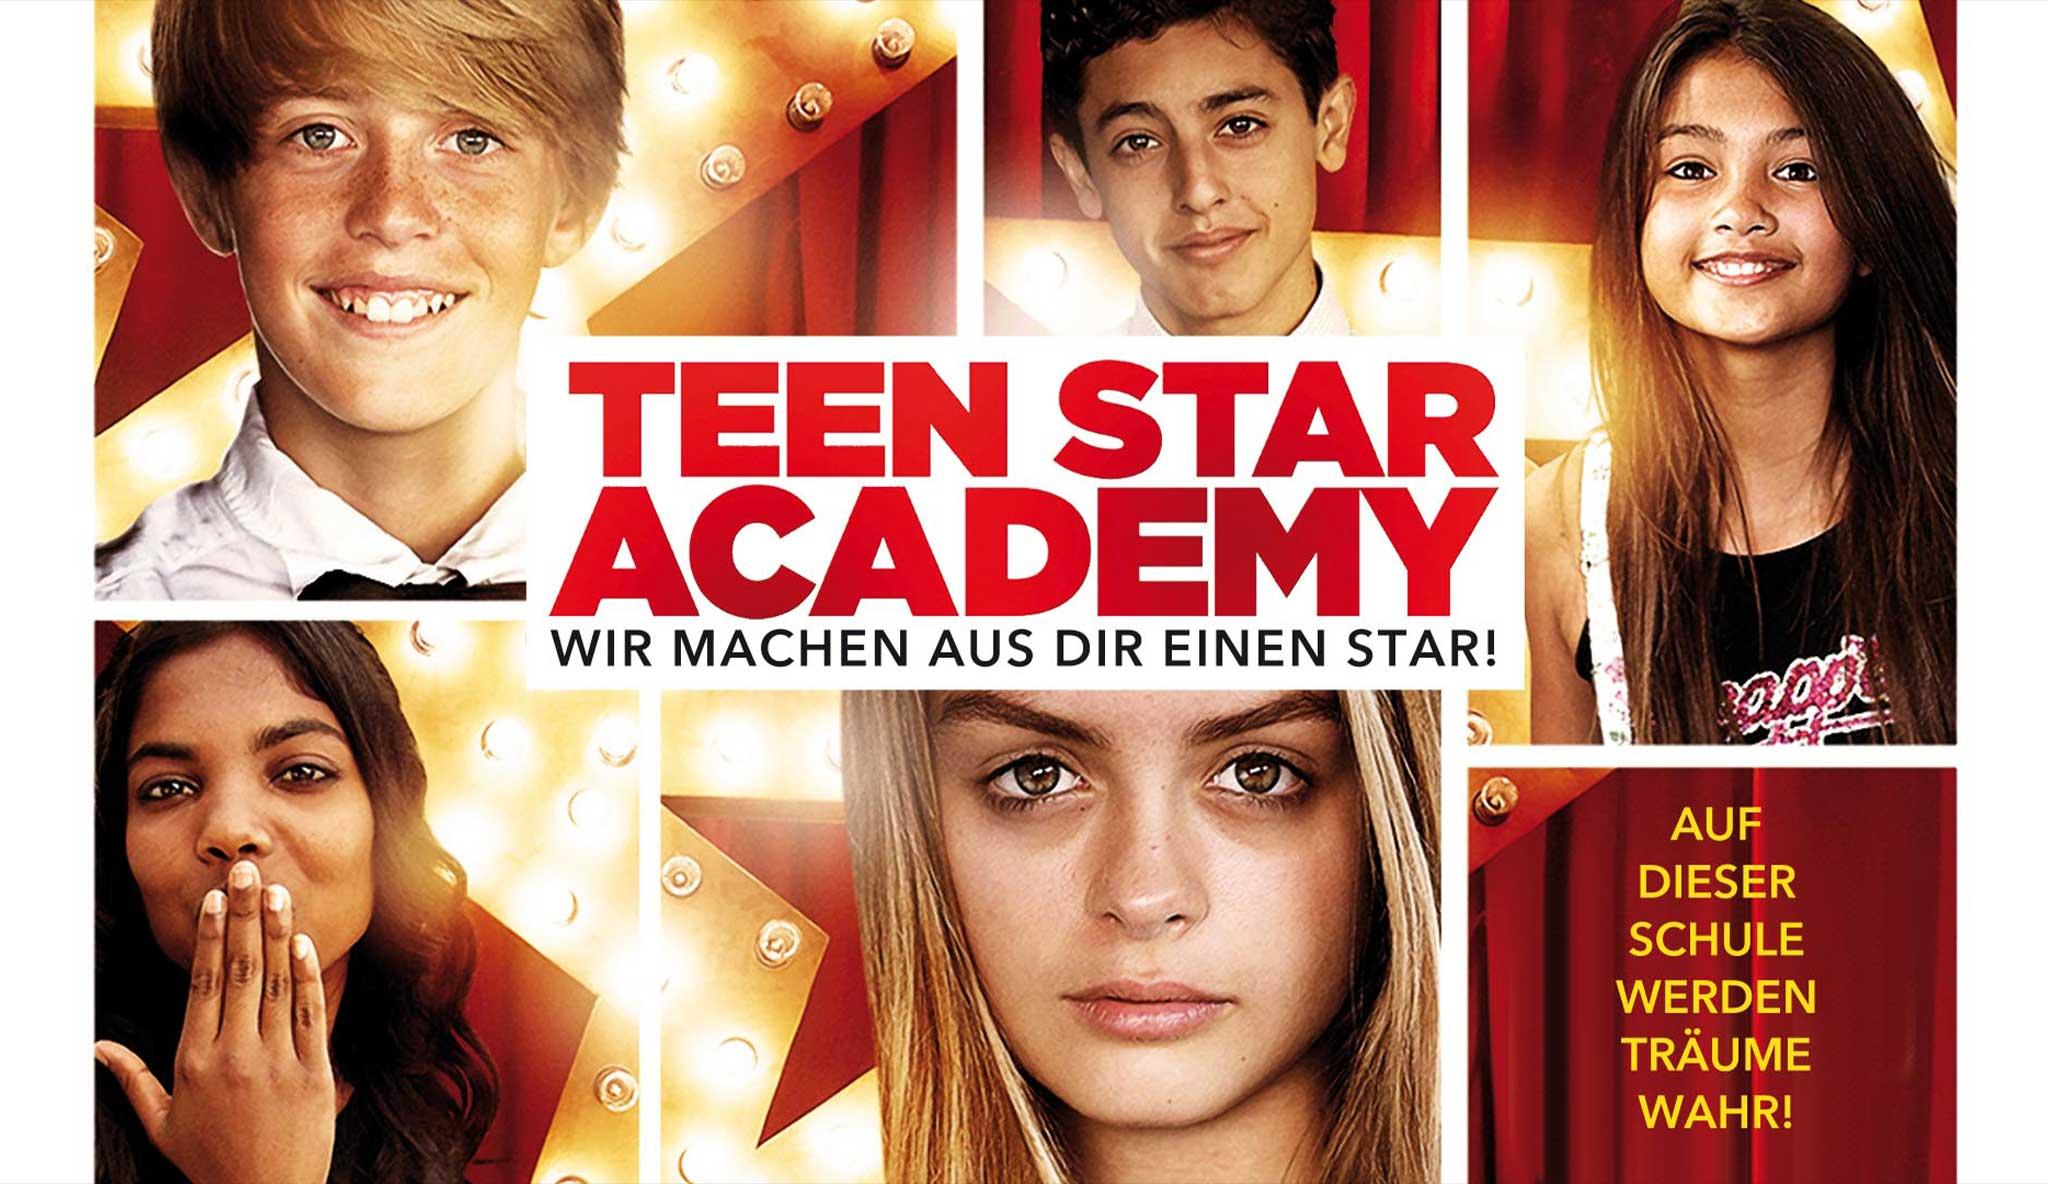 teen-star-academy\header.jpg